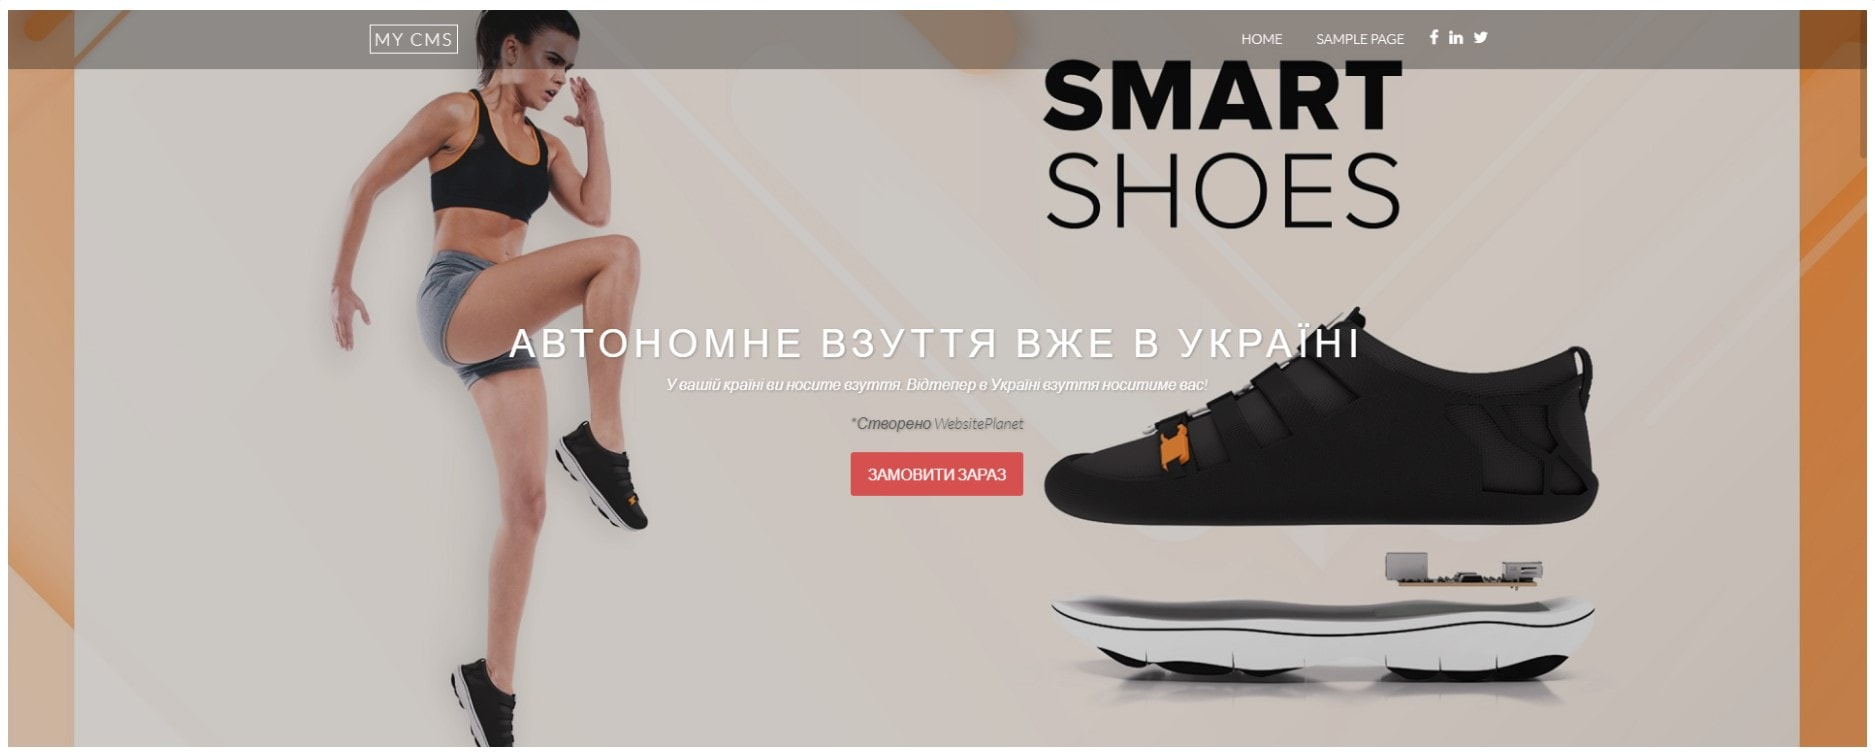 автономне взуття